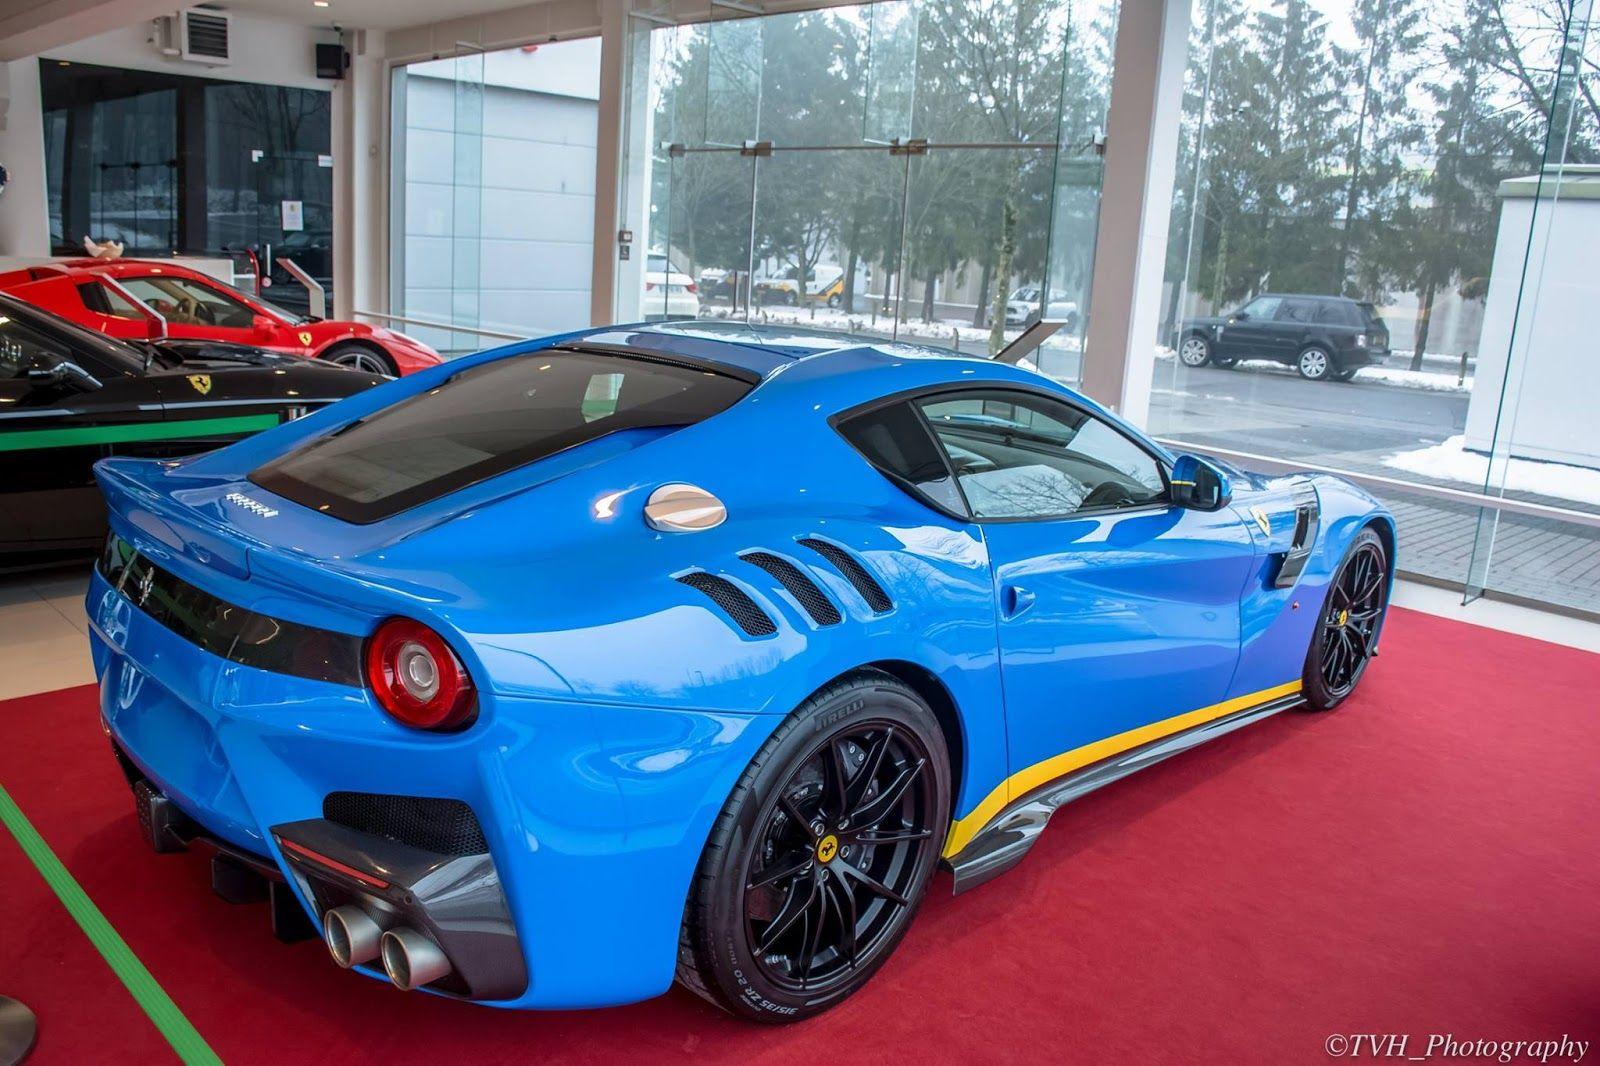 Azzurro Dino Blue Ferrari F12tdf Is A 770hp Smurf | Carscoops